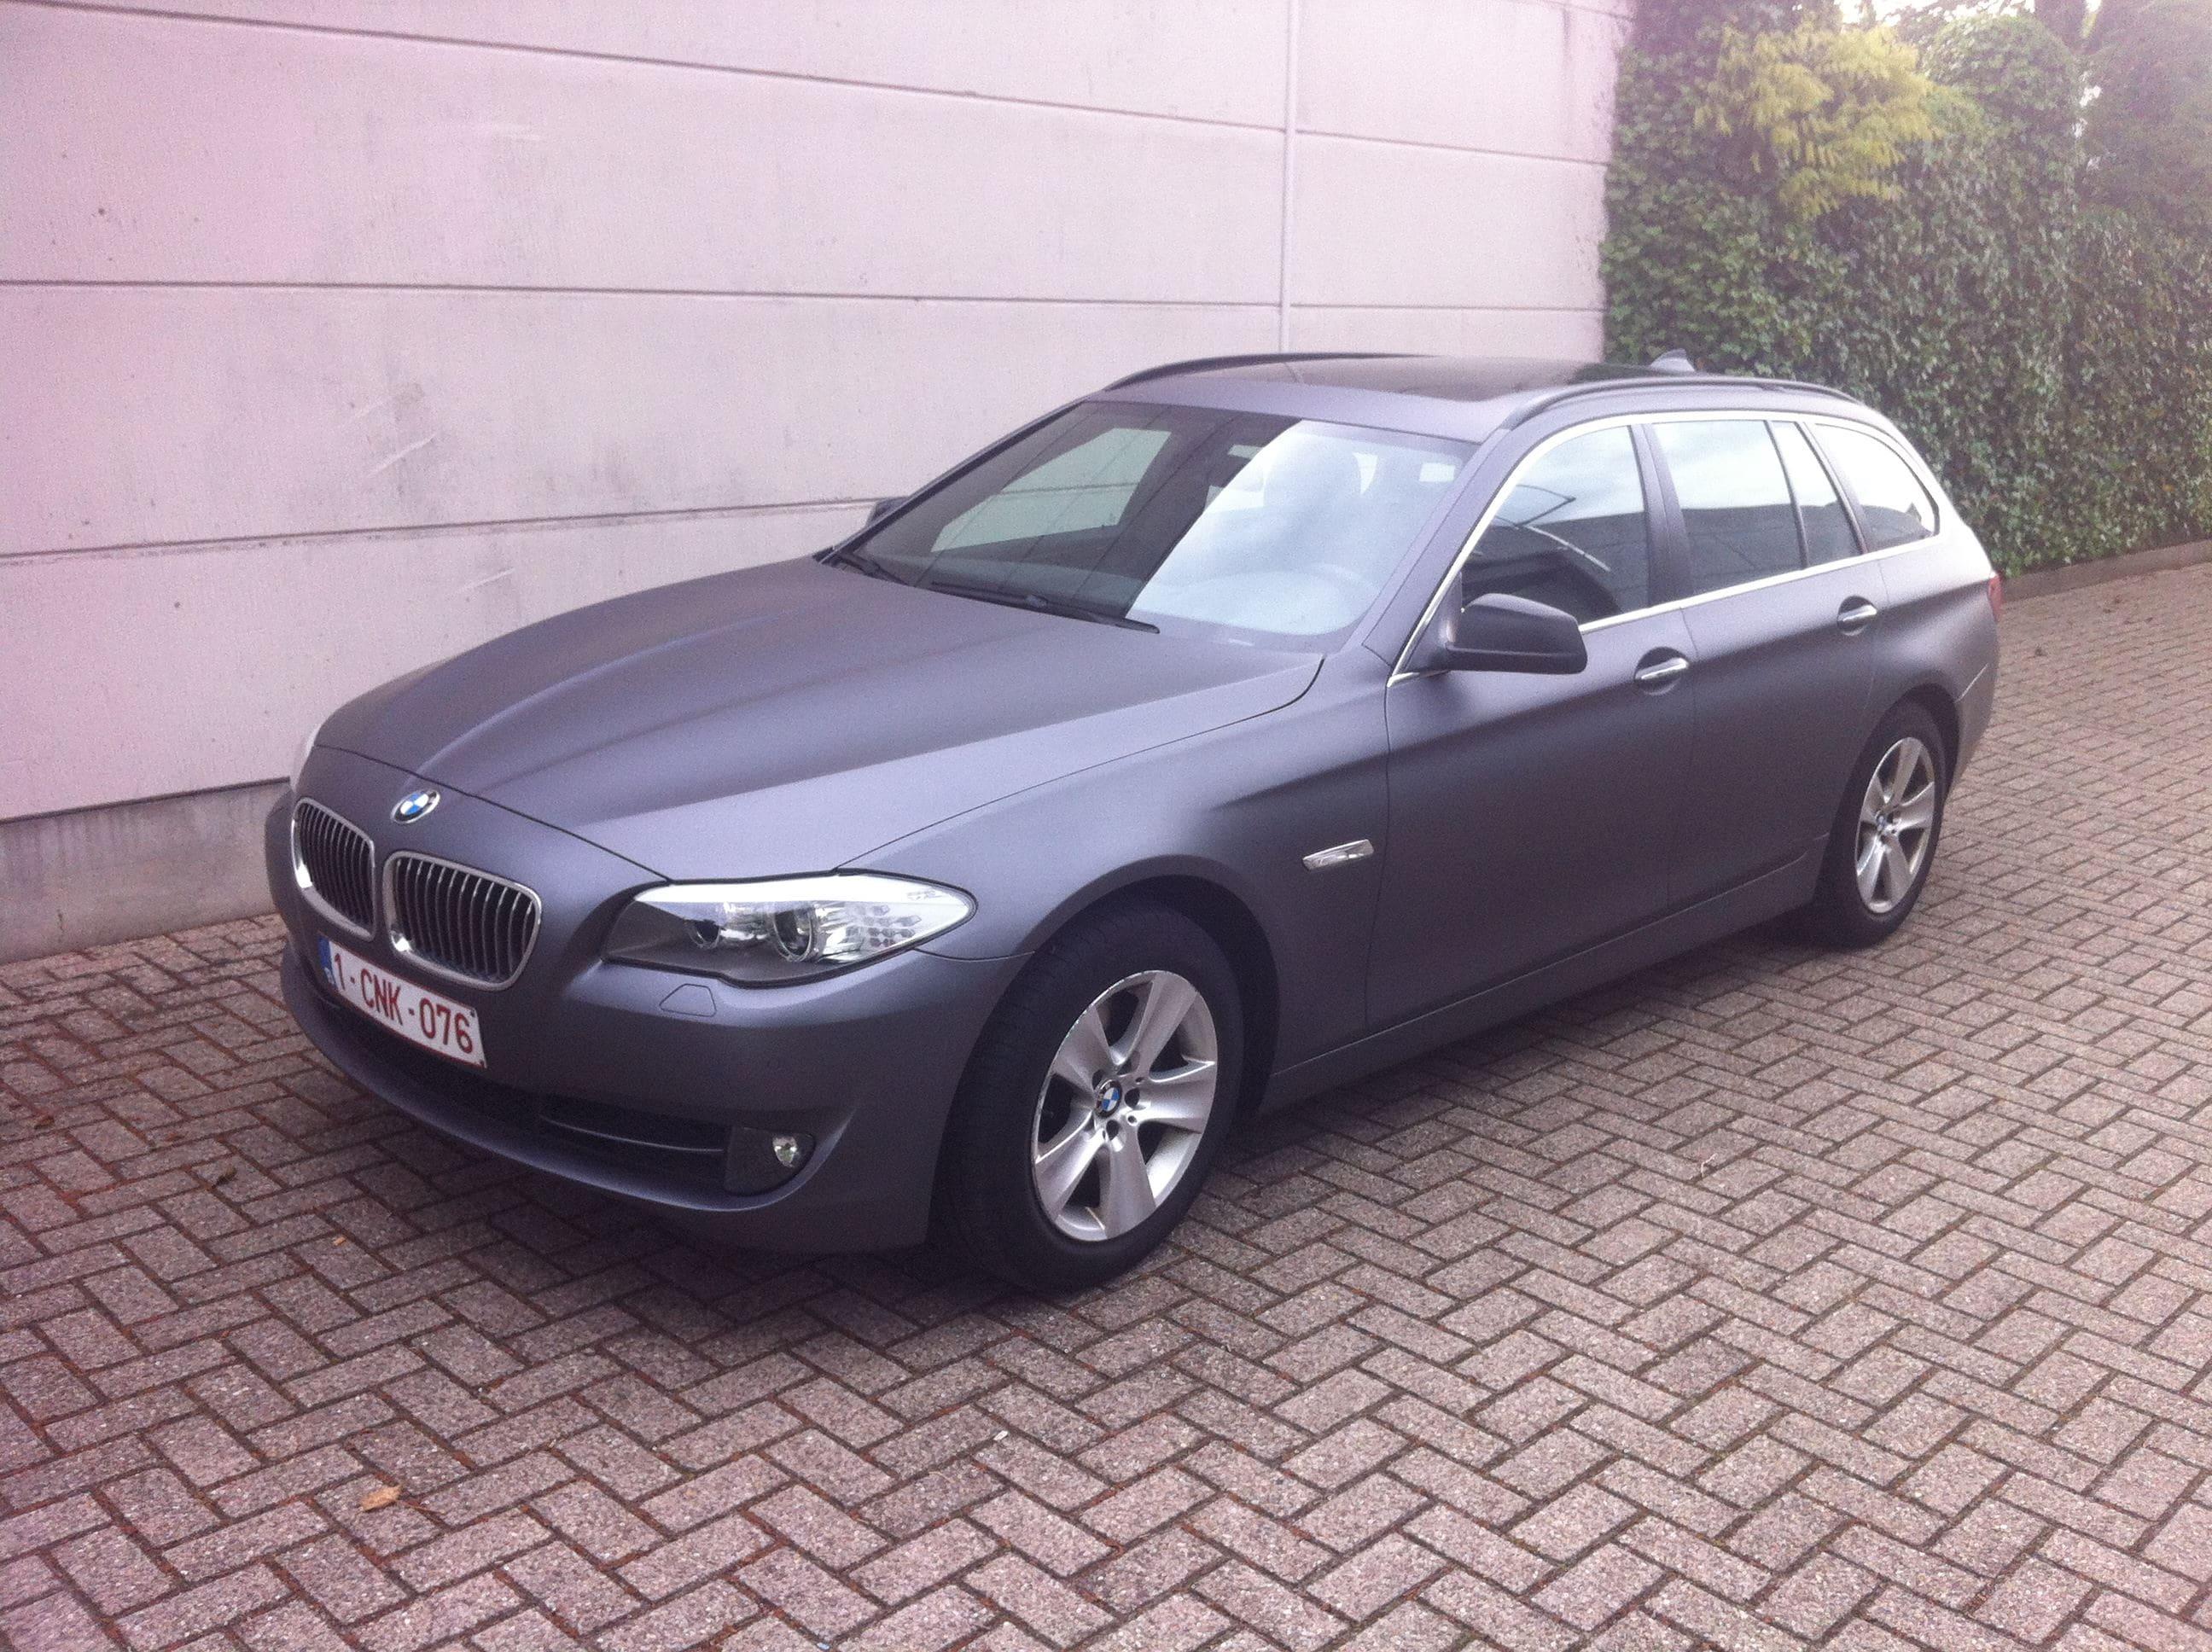 BMW 5 Serie met Gunpowder Wrap, Carwrapping door Wrapmyride.nu Foto-nr:5258, ©2021